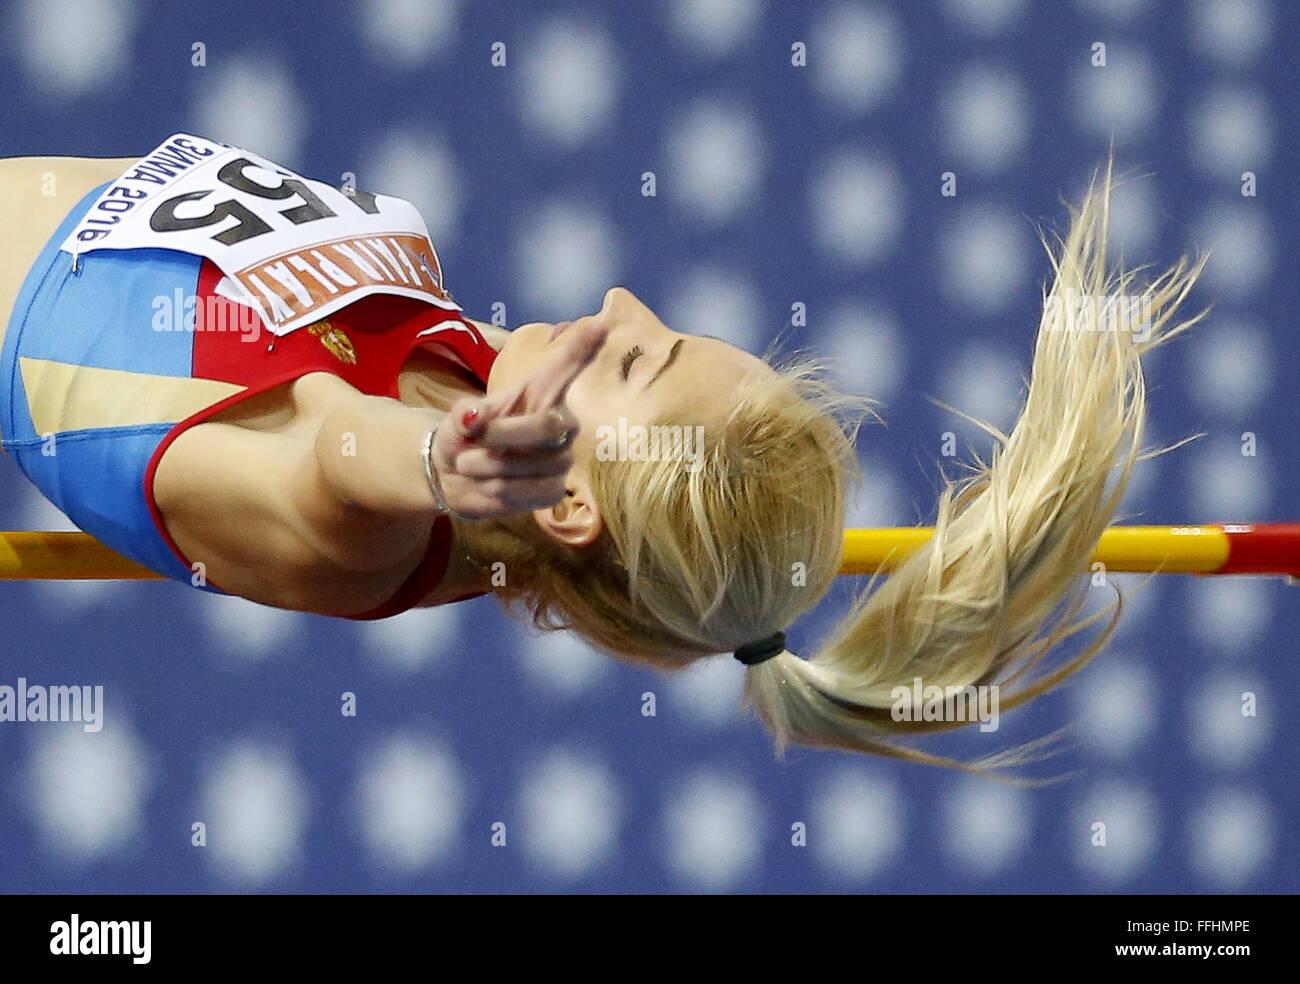 Moskau, Russland. 14. Februar 2016. Yekaterina Fedotova Russlands konkurriert in der Frauen-Hochsprung-Veranstaltung Stockbild